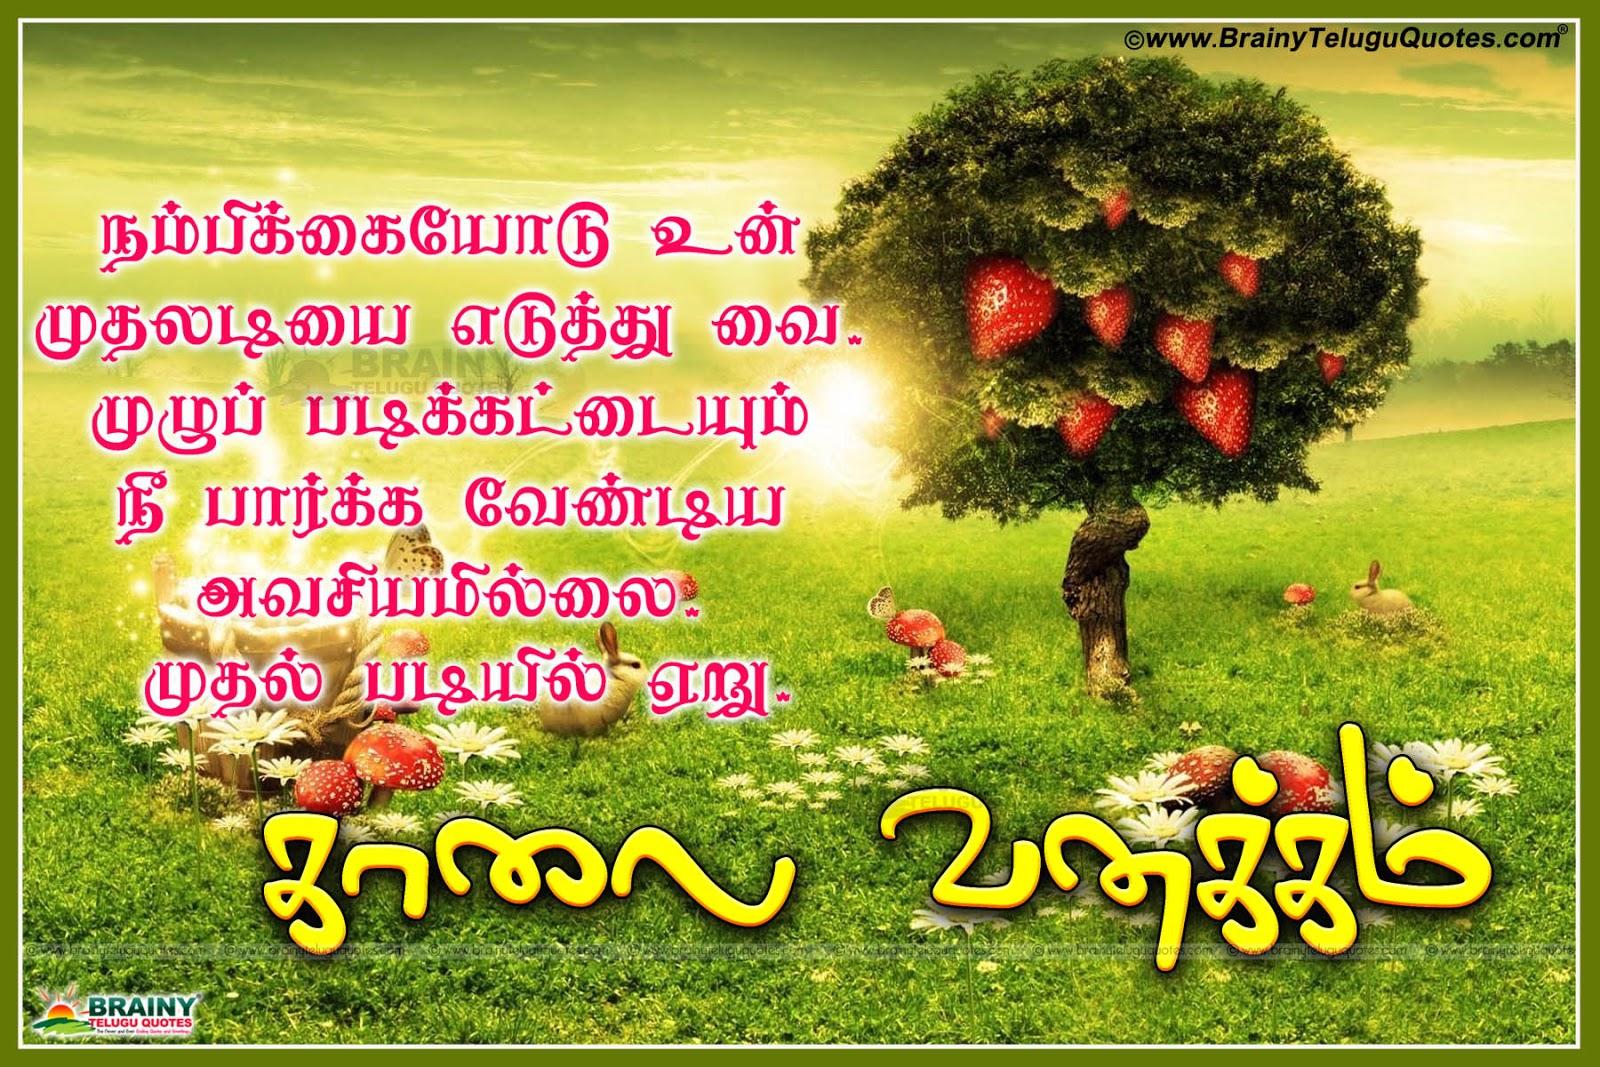 tamil new good morning images kalai vanakkam wallpaper